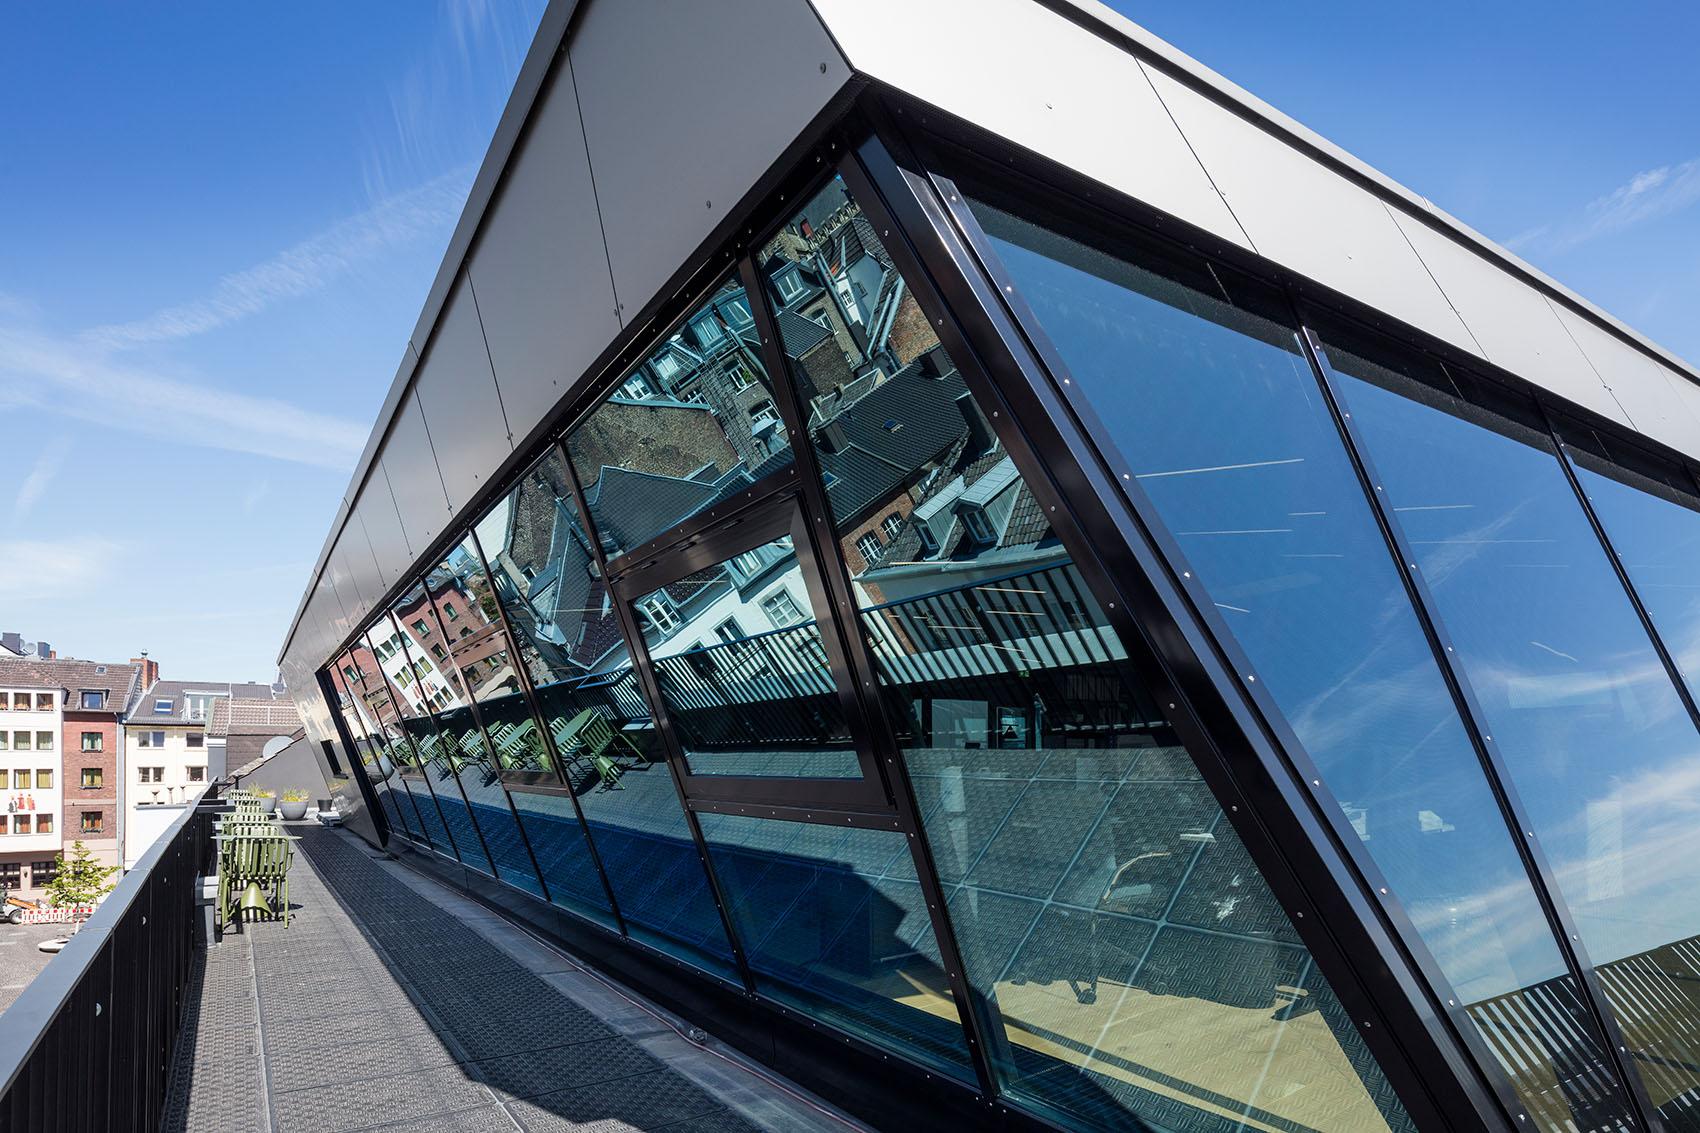 7_Rooftop-Office-Aachen_CROSS-Architecture.jpg